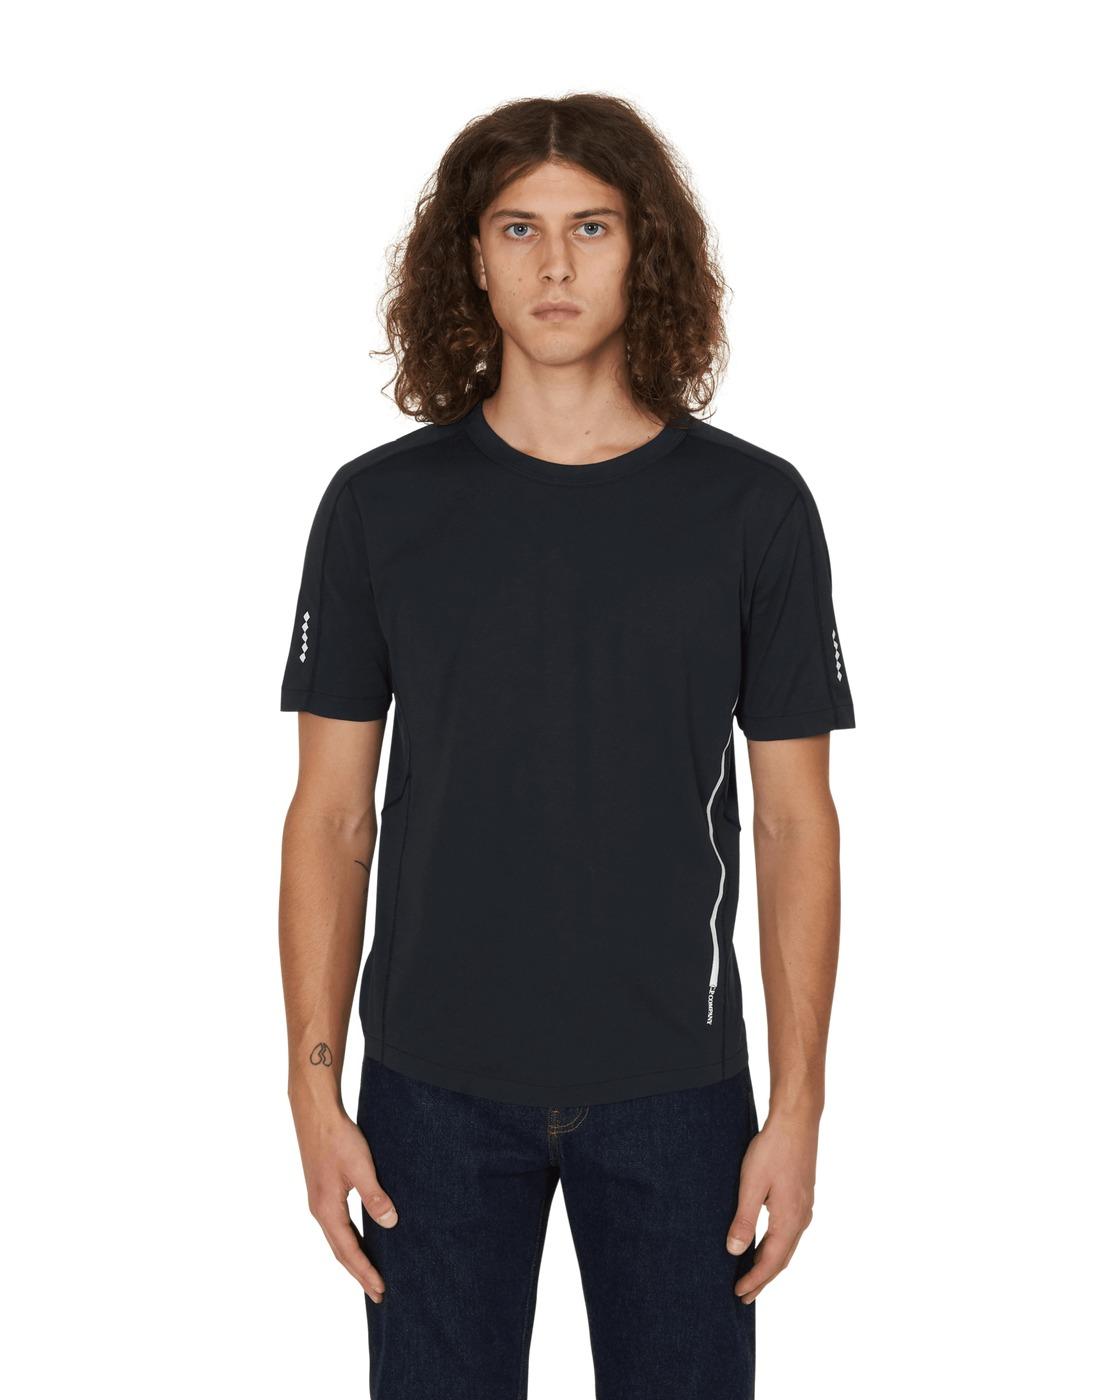 C.P. Company T Shirts Black